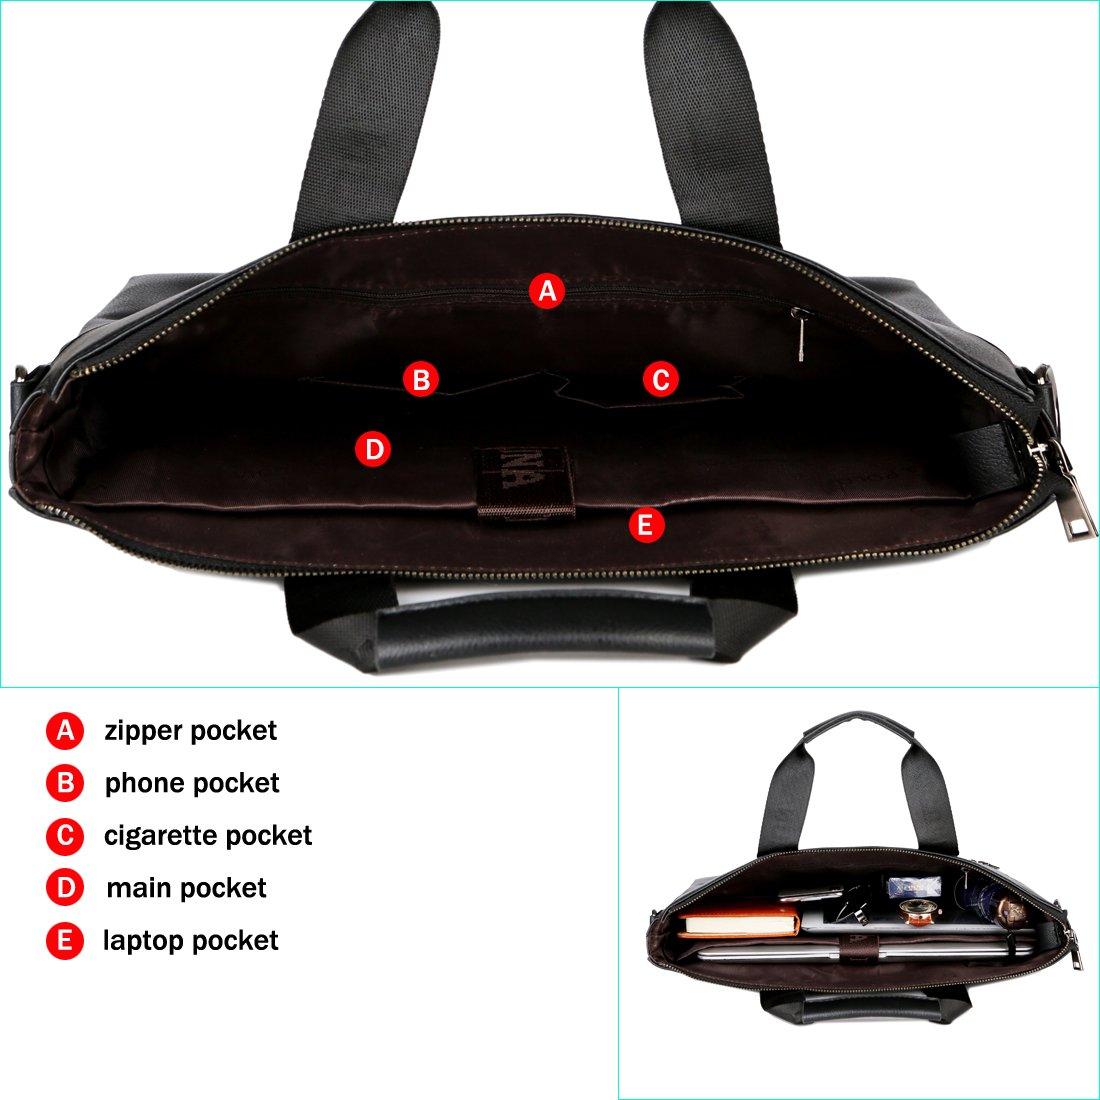 VICUNA POLO Men Briefcase Bag Business Bag Leather Laptop Bag Man Bag Handbag (black for 15.6inch) by VICUNA POLO (Image #4)